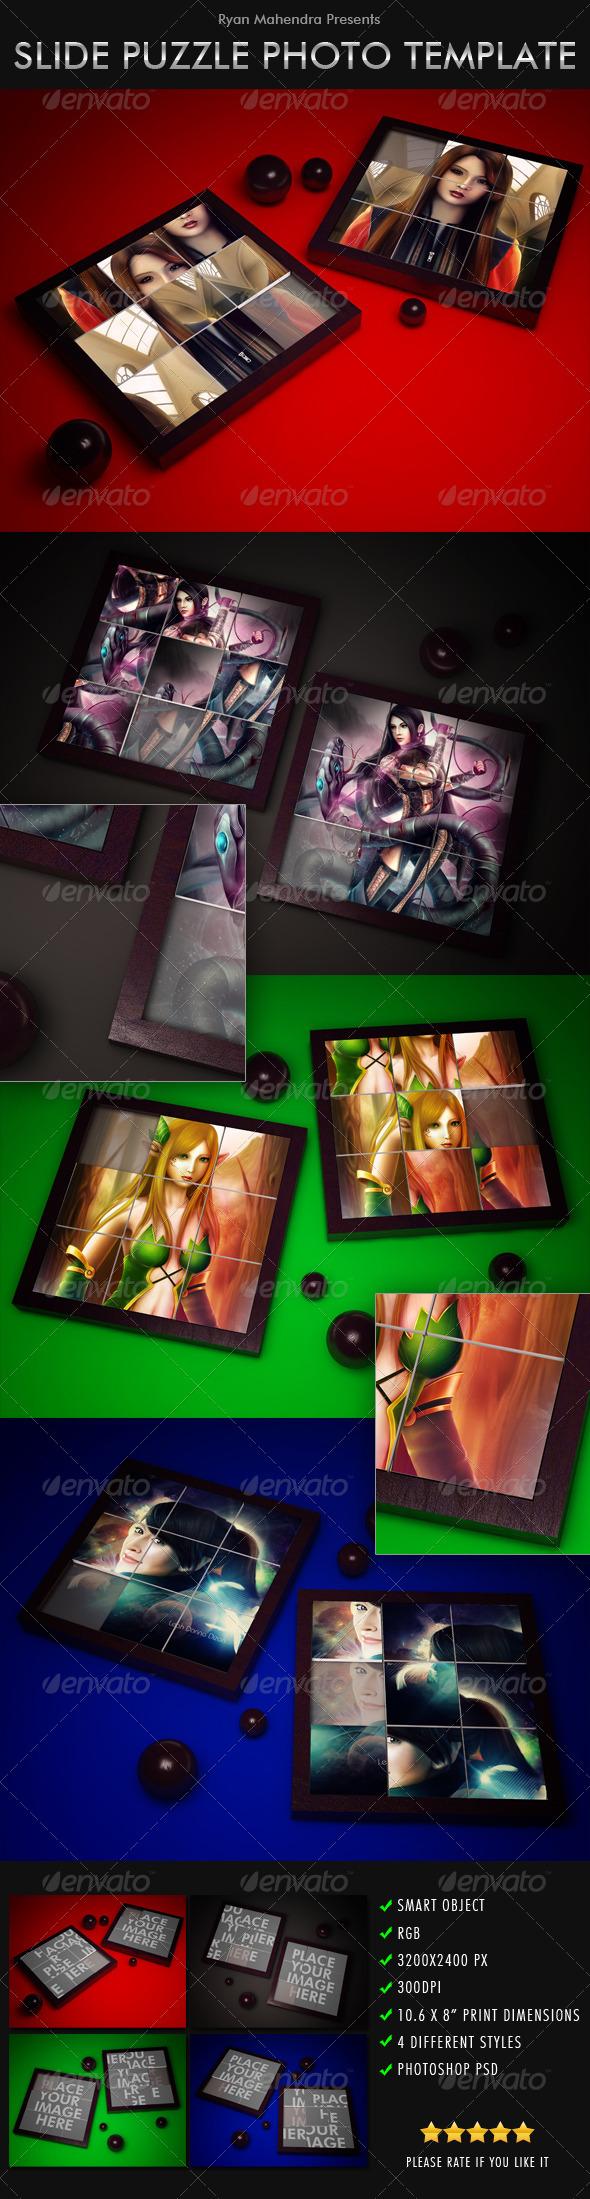 Slide Puzzle Photo Template - Photo Templates Graphics